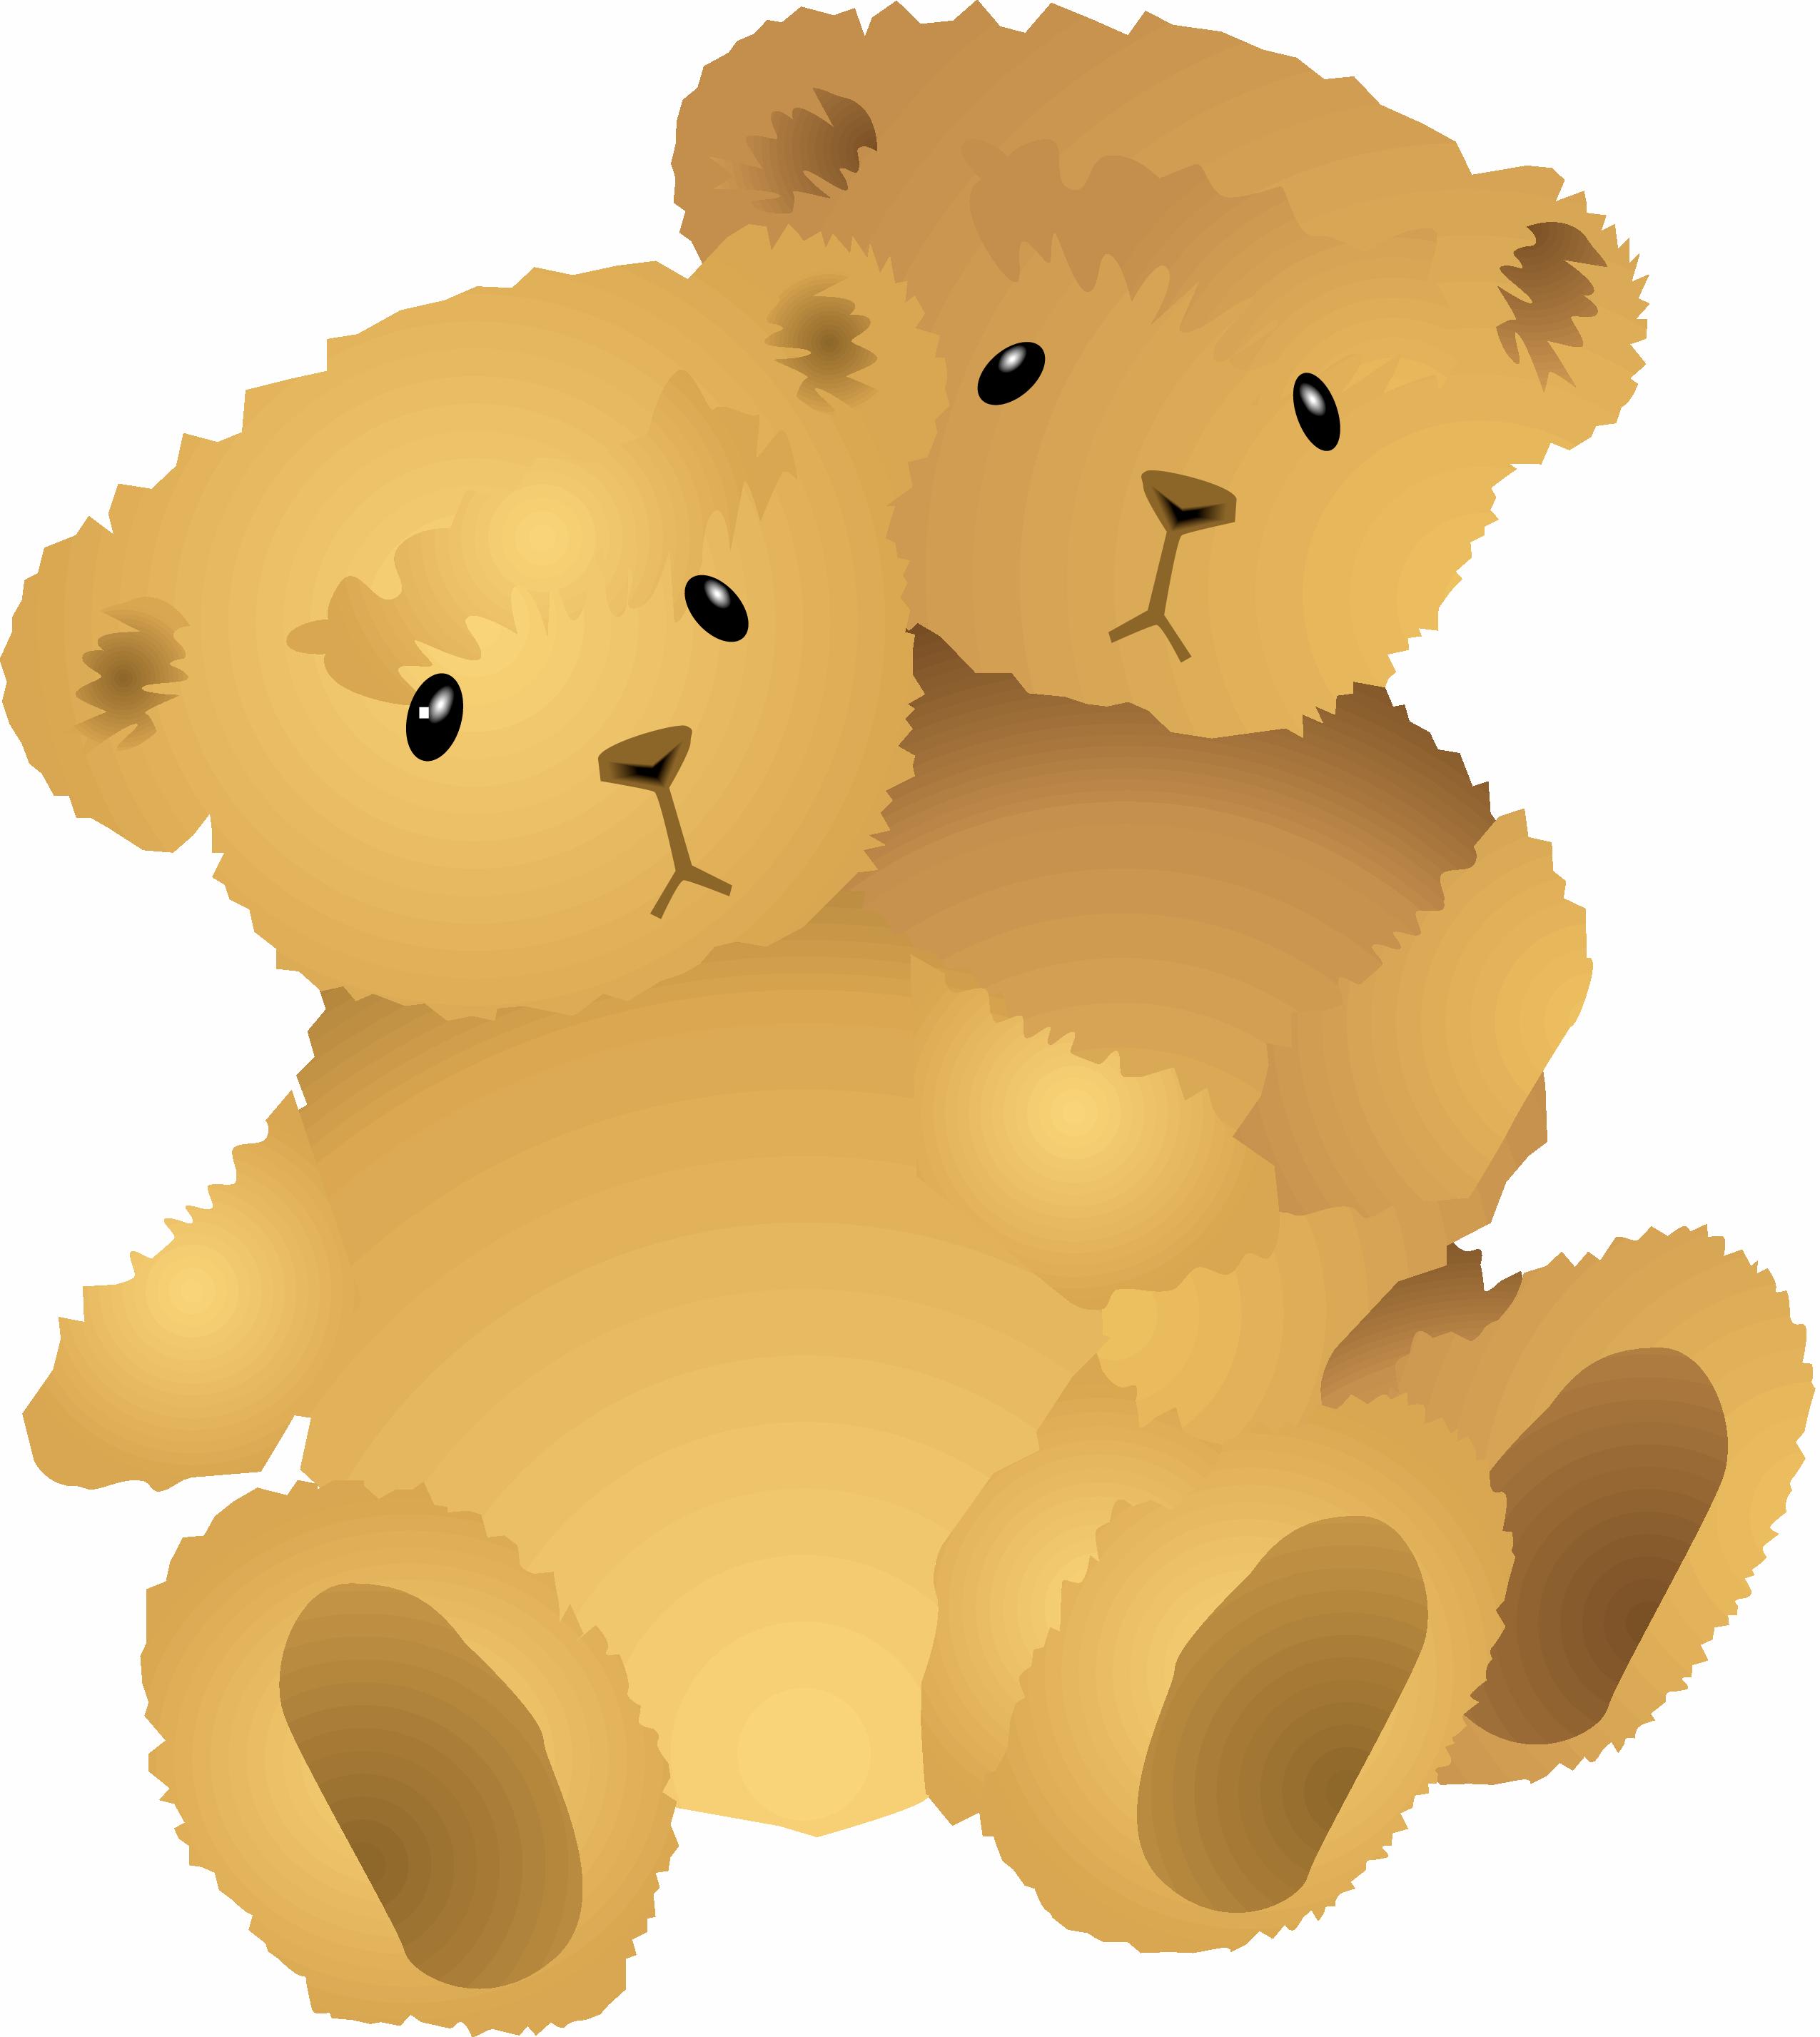 Tree clipart hug. Jokingart com teddy bear